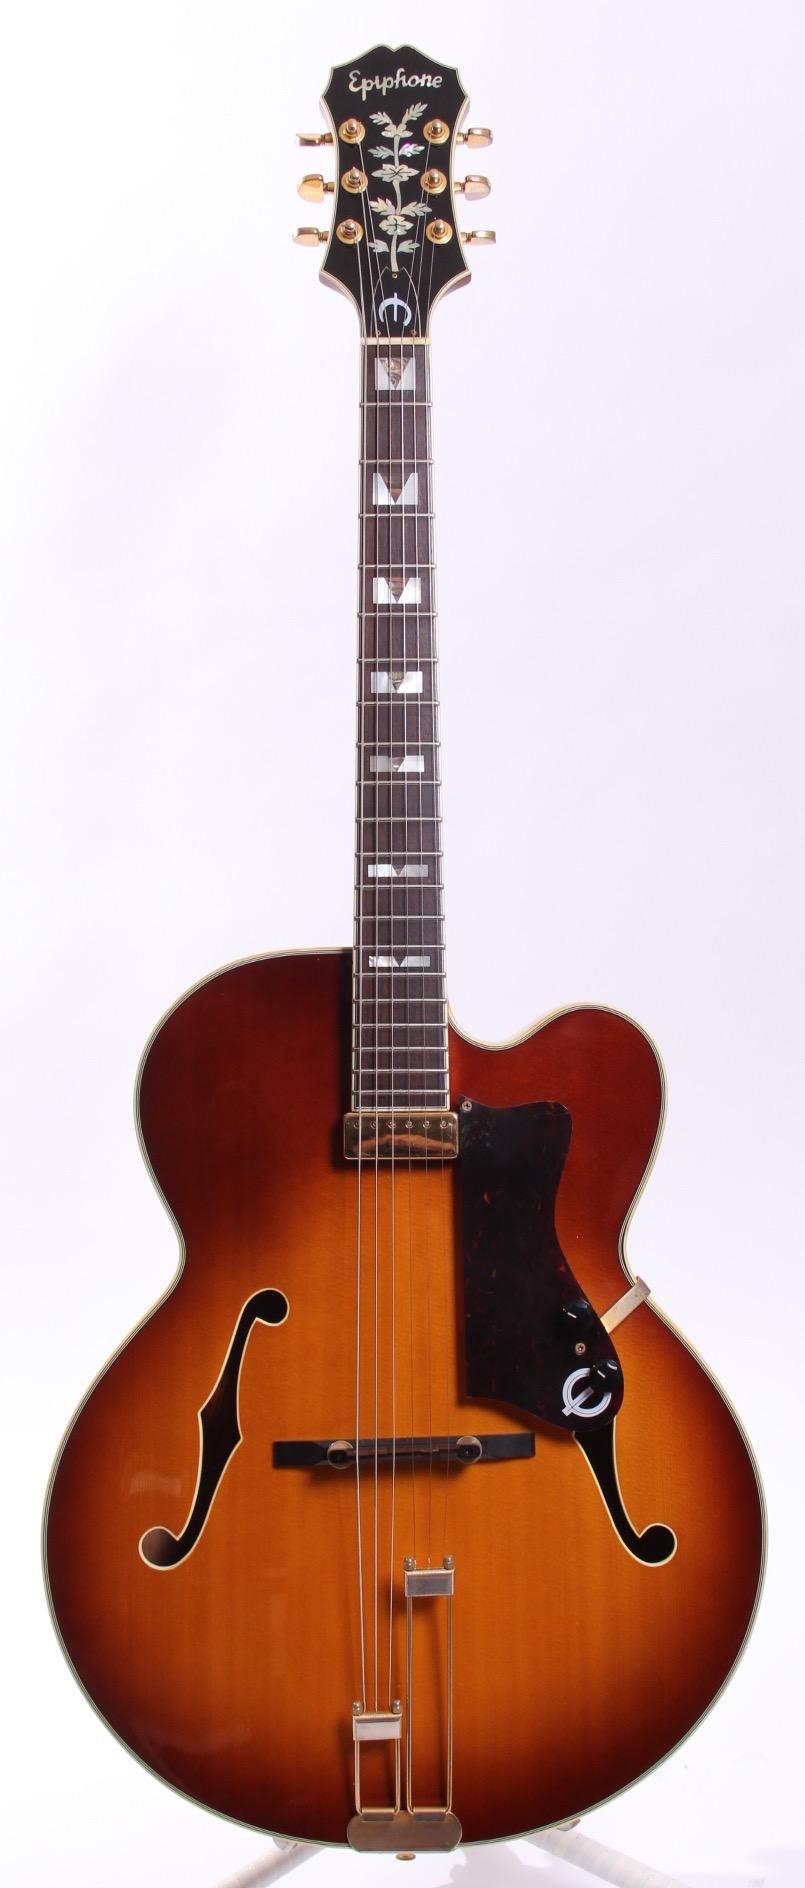 epiphone japan emperor solid top 1991 sunburst guitar for sale yeahman 39 s guitars. Black Bedroom Furniture Sets. Home Design Ideas